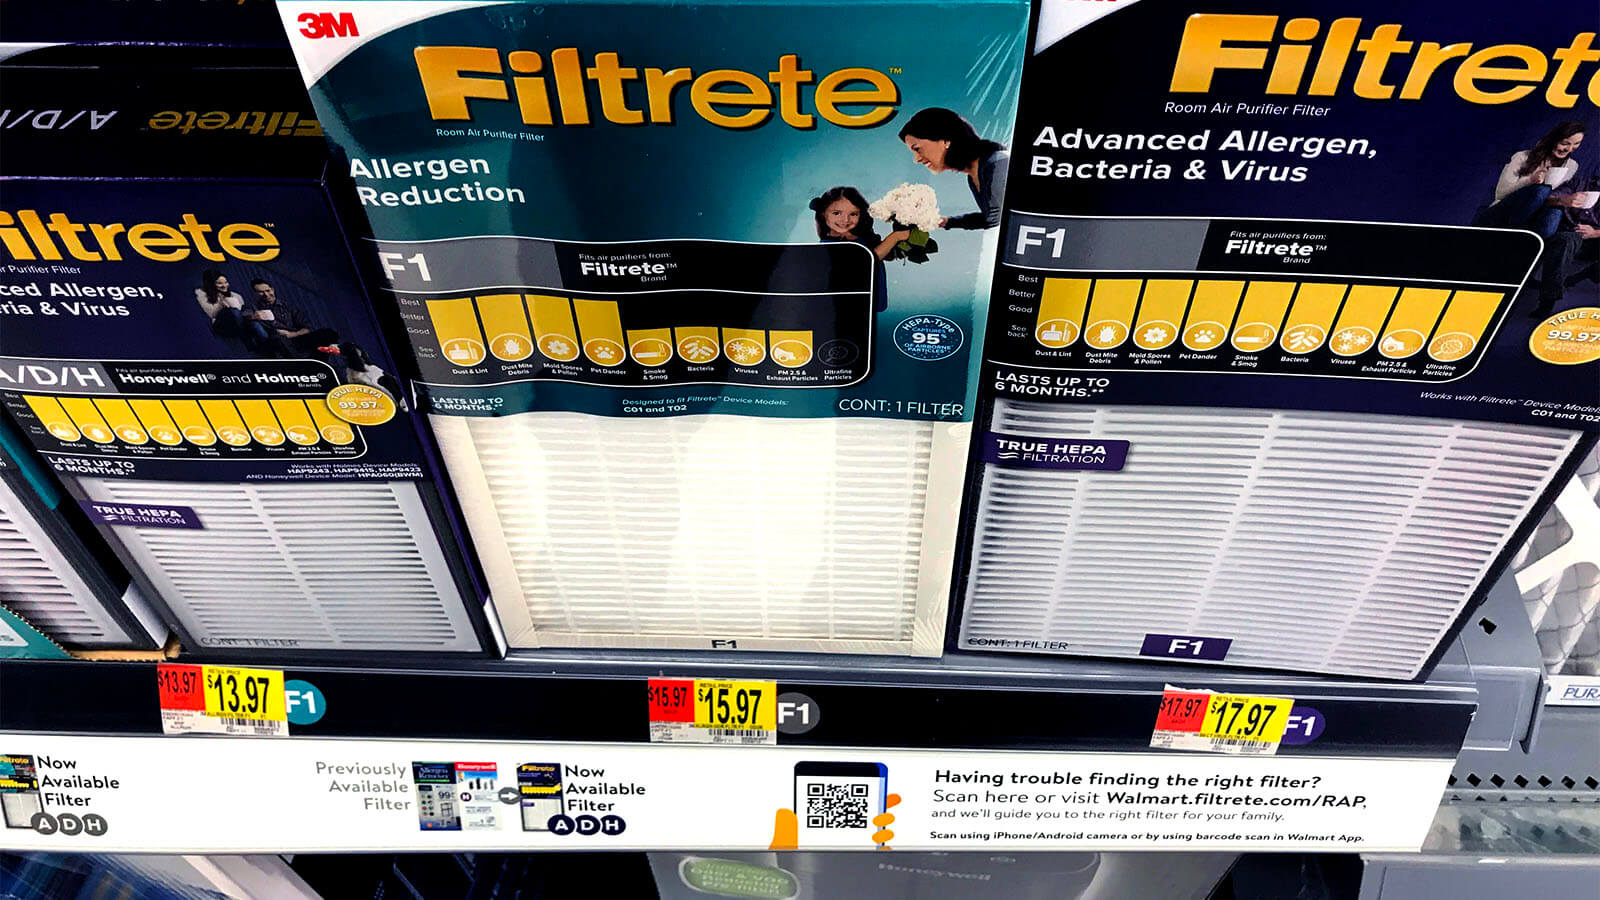 3M Filtrete filters on Walmart store shelf